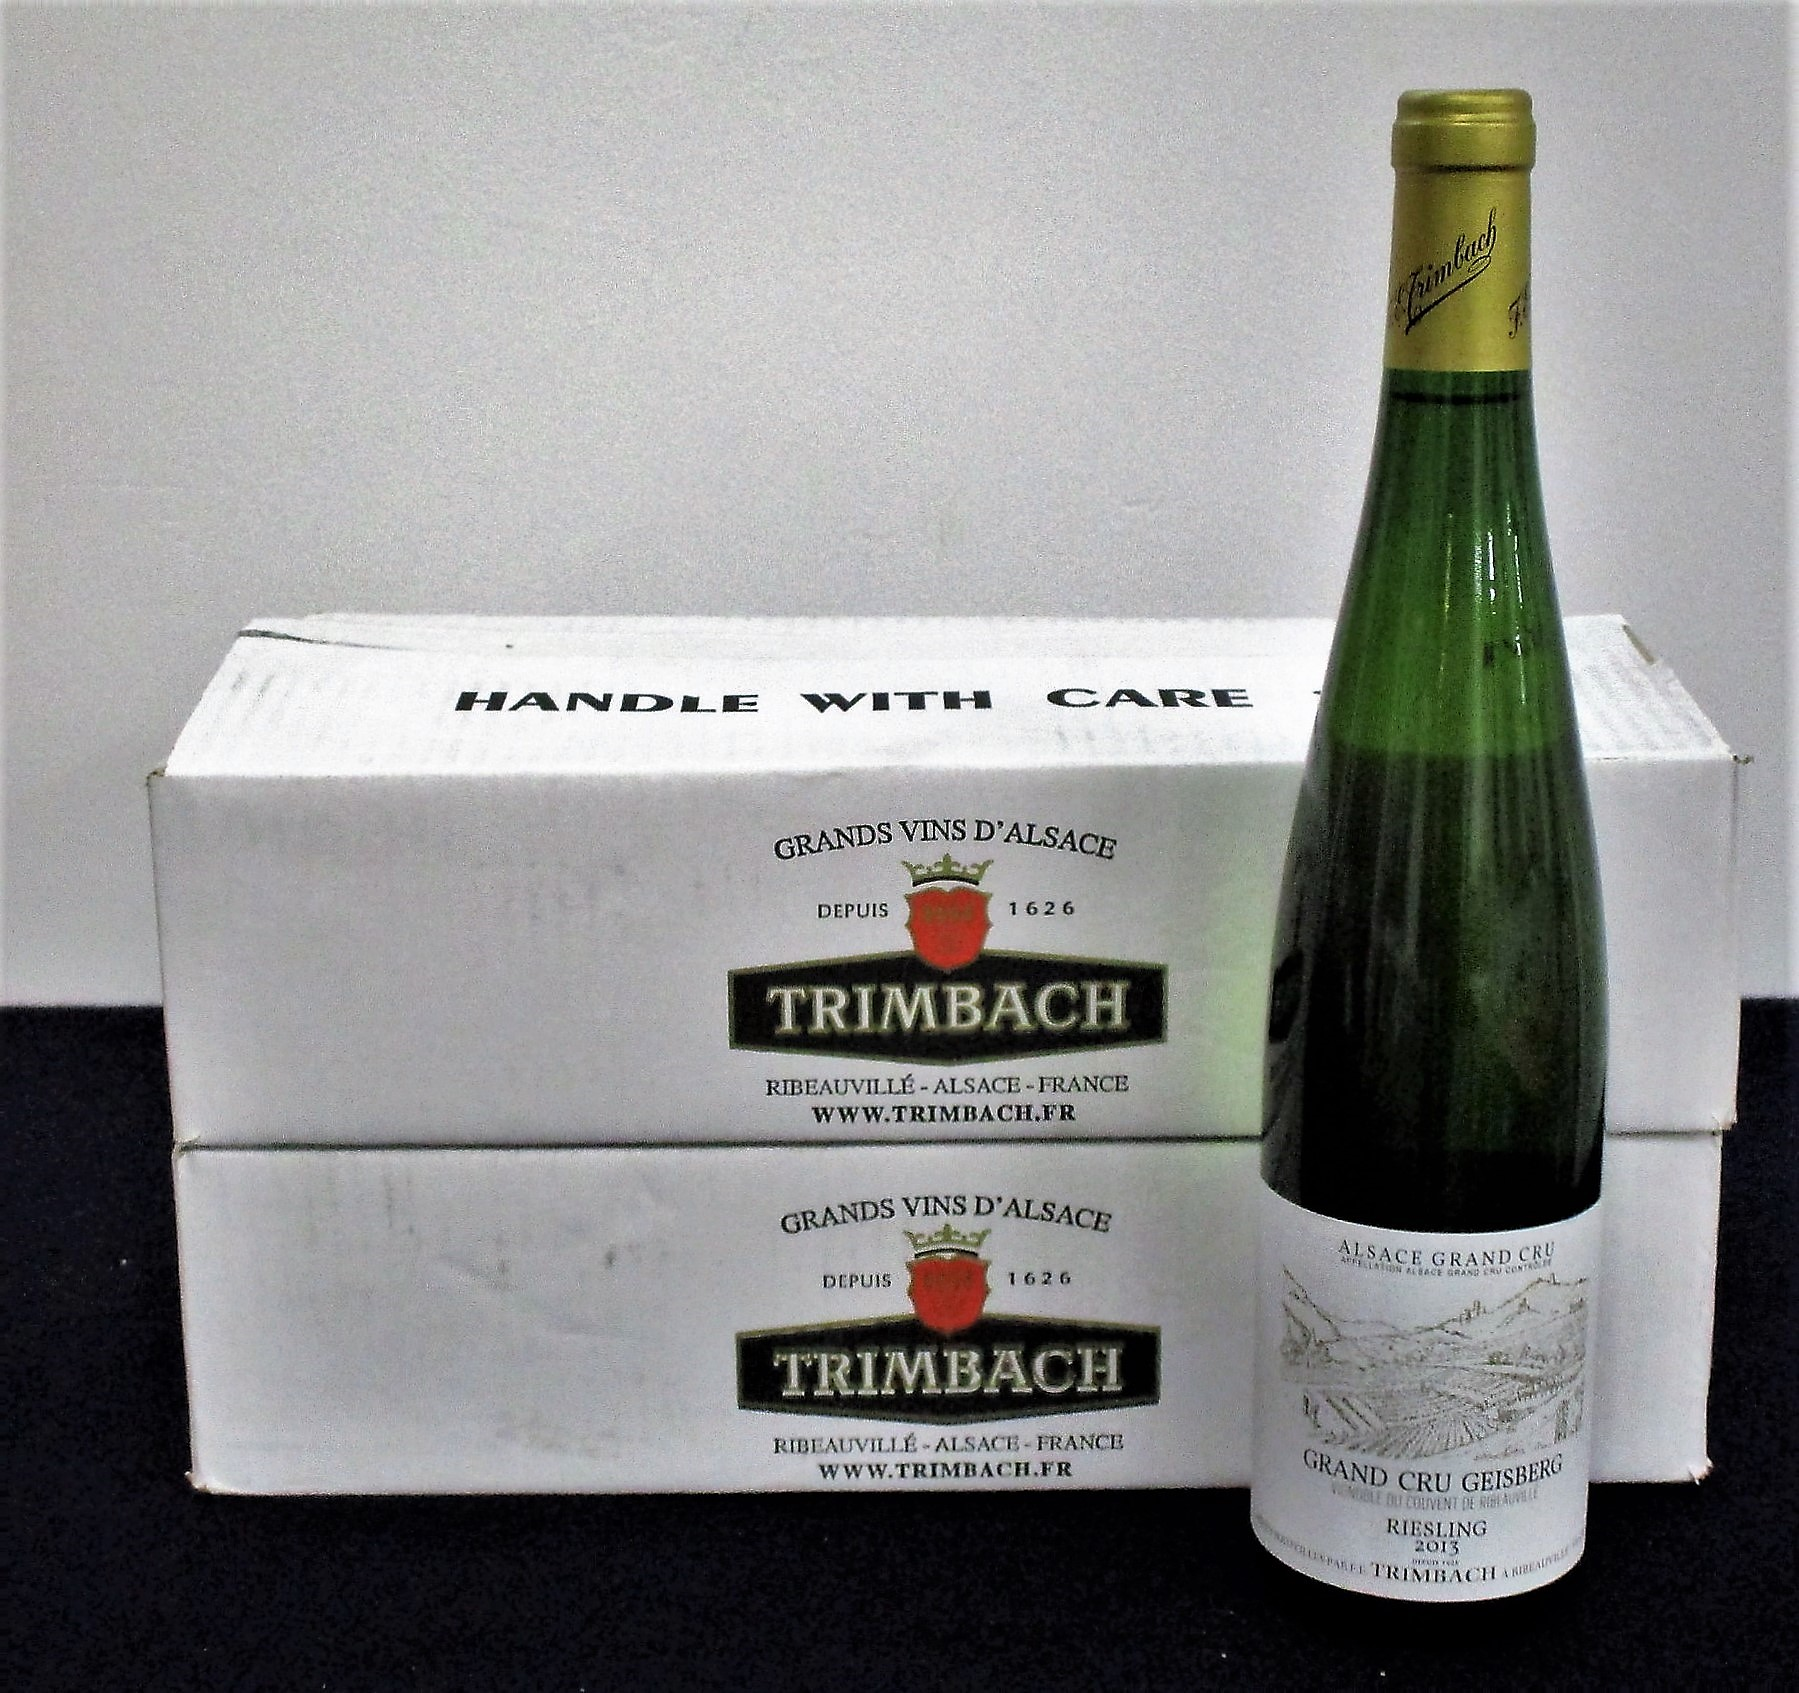 6 bts Trimbach Riesling Grand Cru Geisberg 2013 oc (2 x 3 bt)